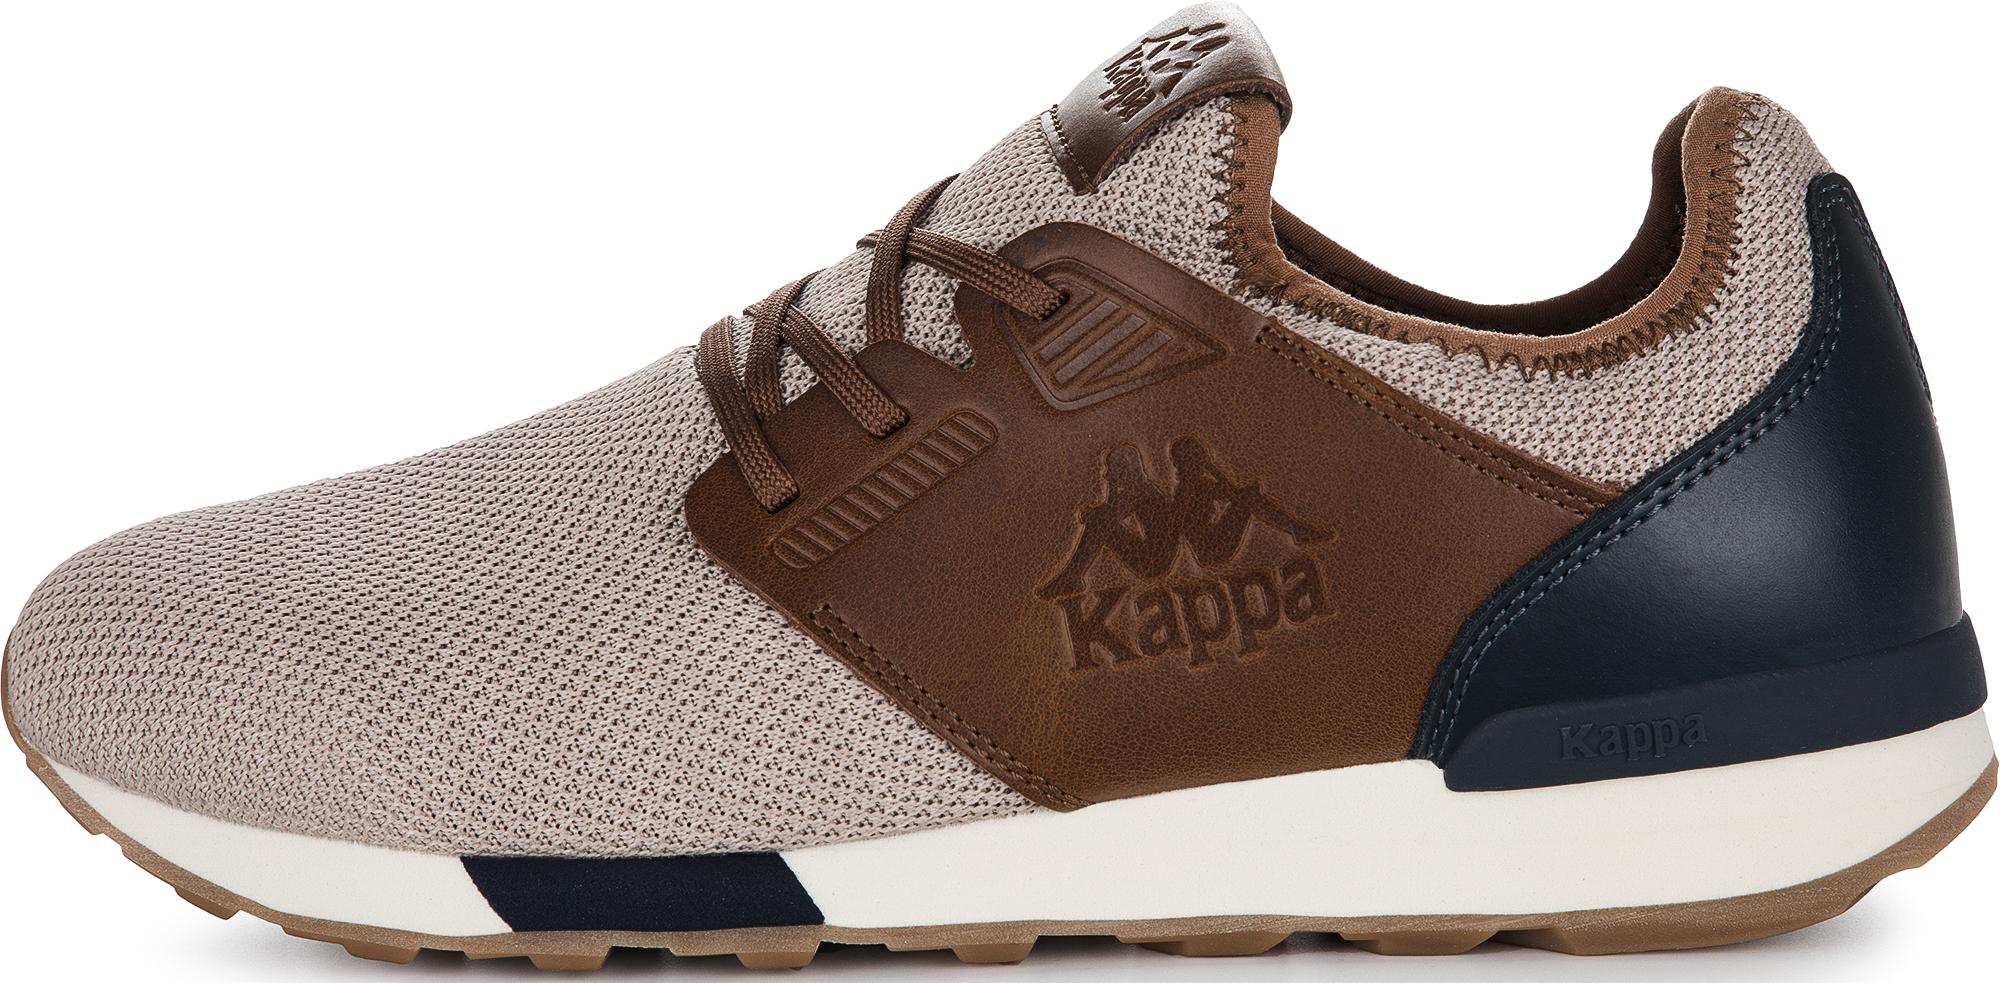 купить Kappa Кроссовки мужские Kappa Authentic Run Knit, размер 43,5 по цене 2249 рублей